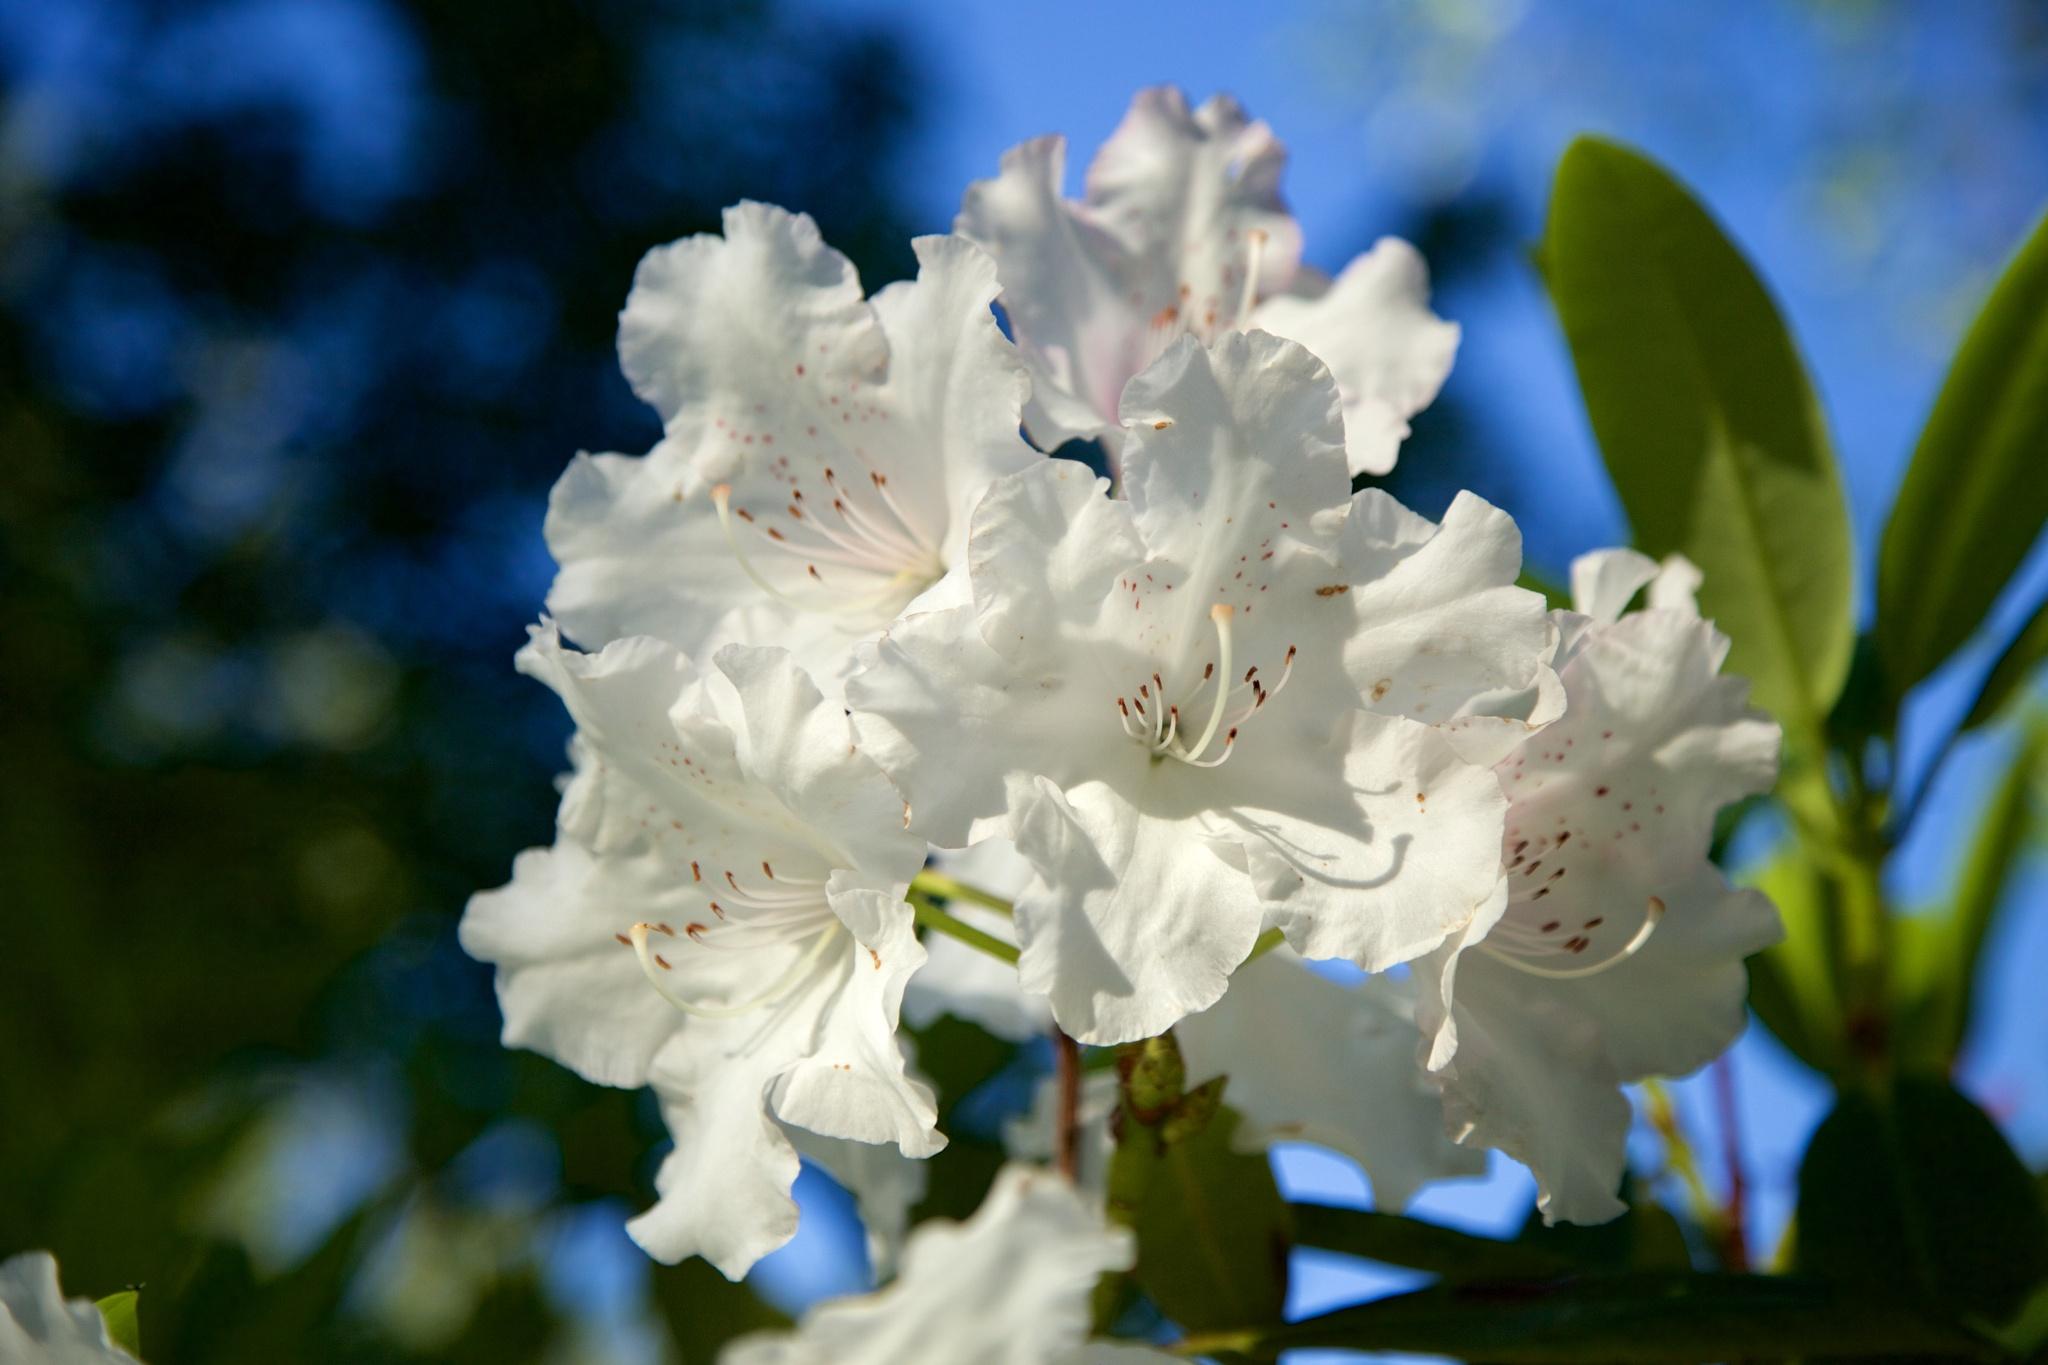 White beauty by lesleyshone